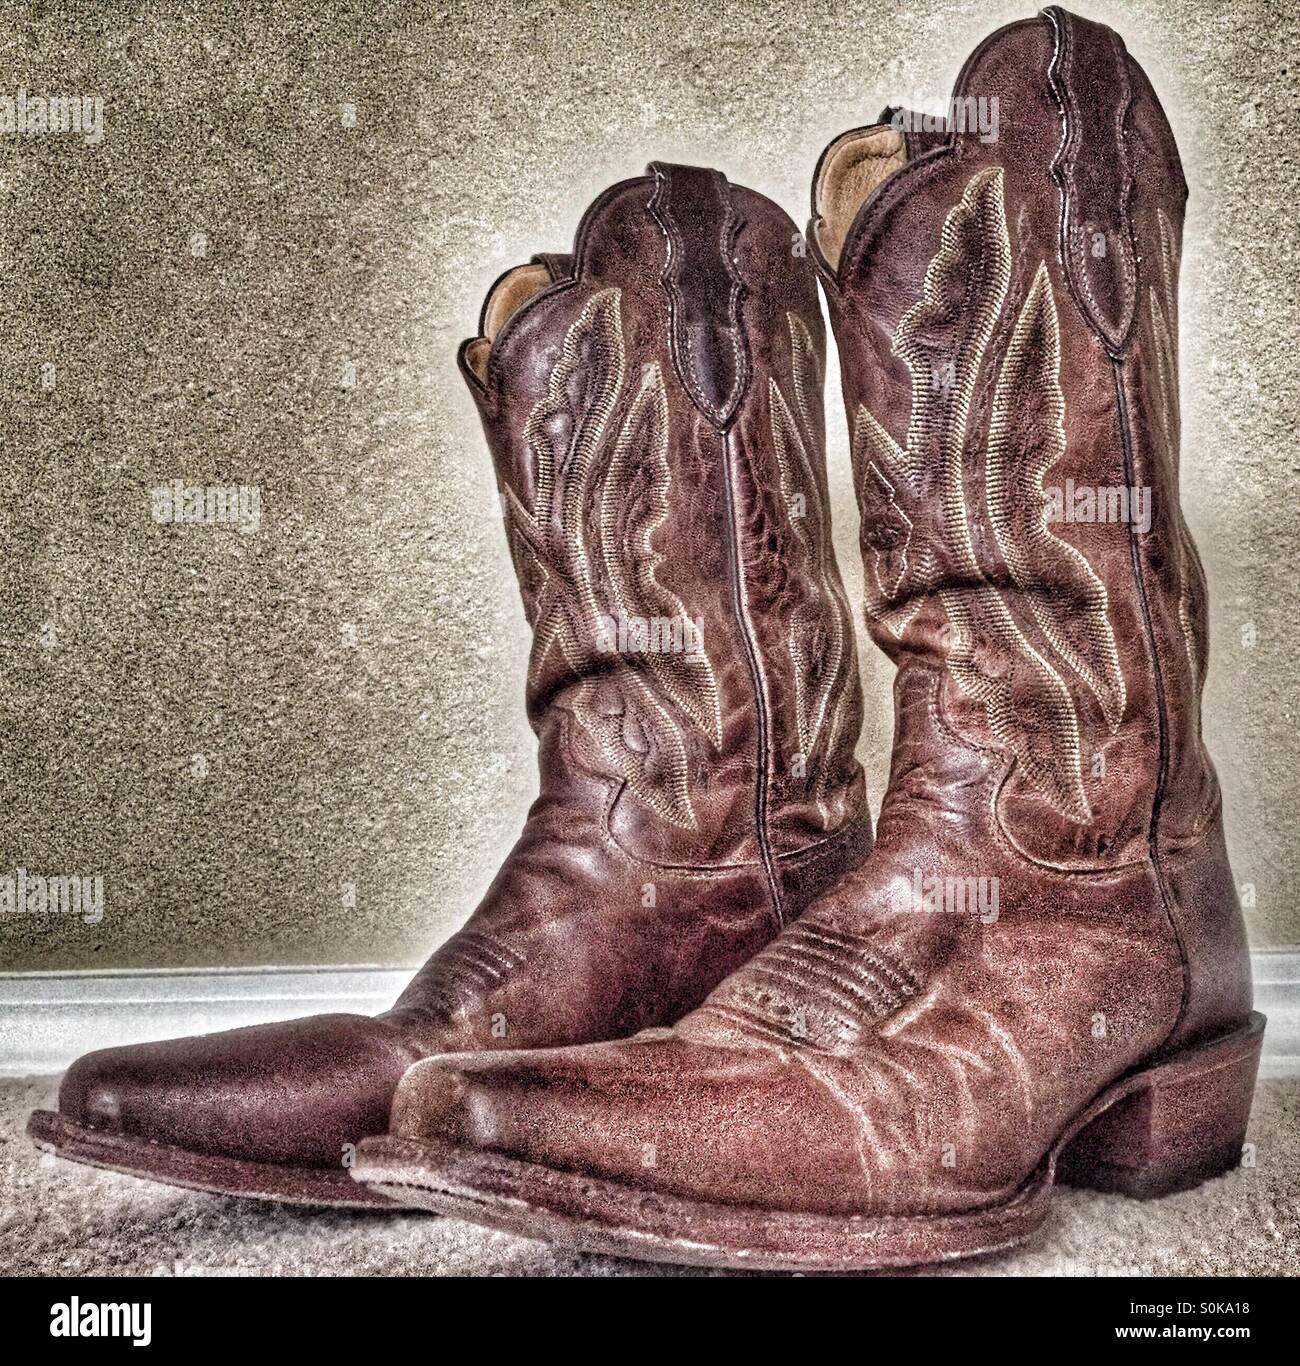 21d98357bd6 Worn cowboy boots Stock Photo: 310211588 - Alamy